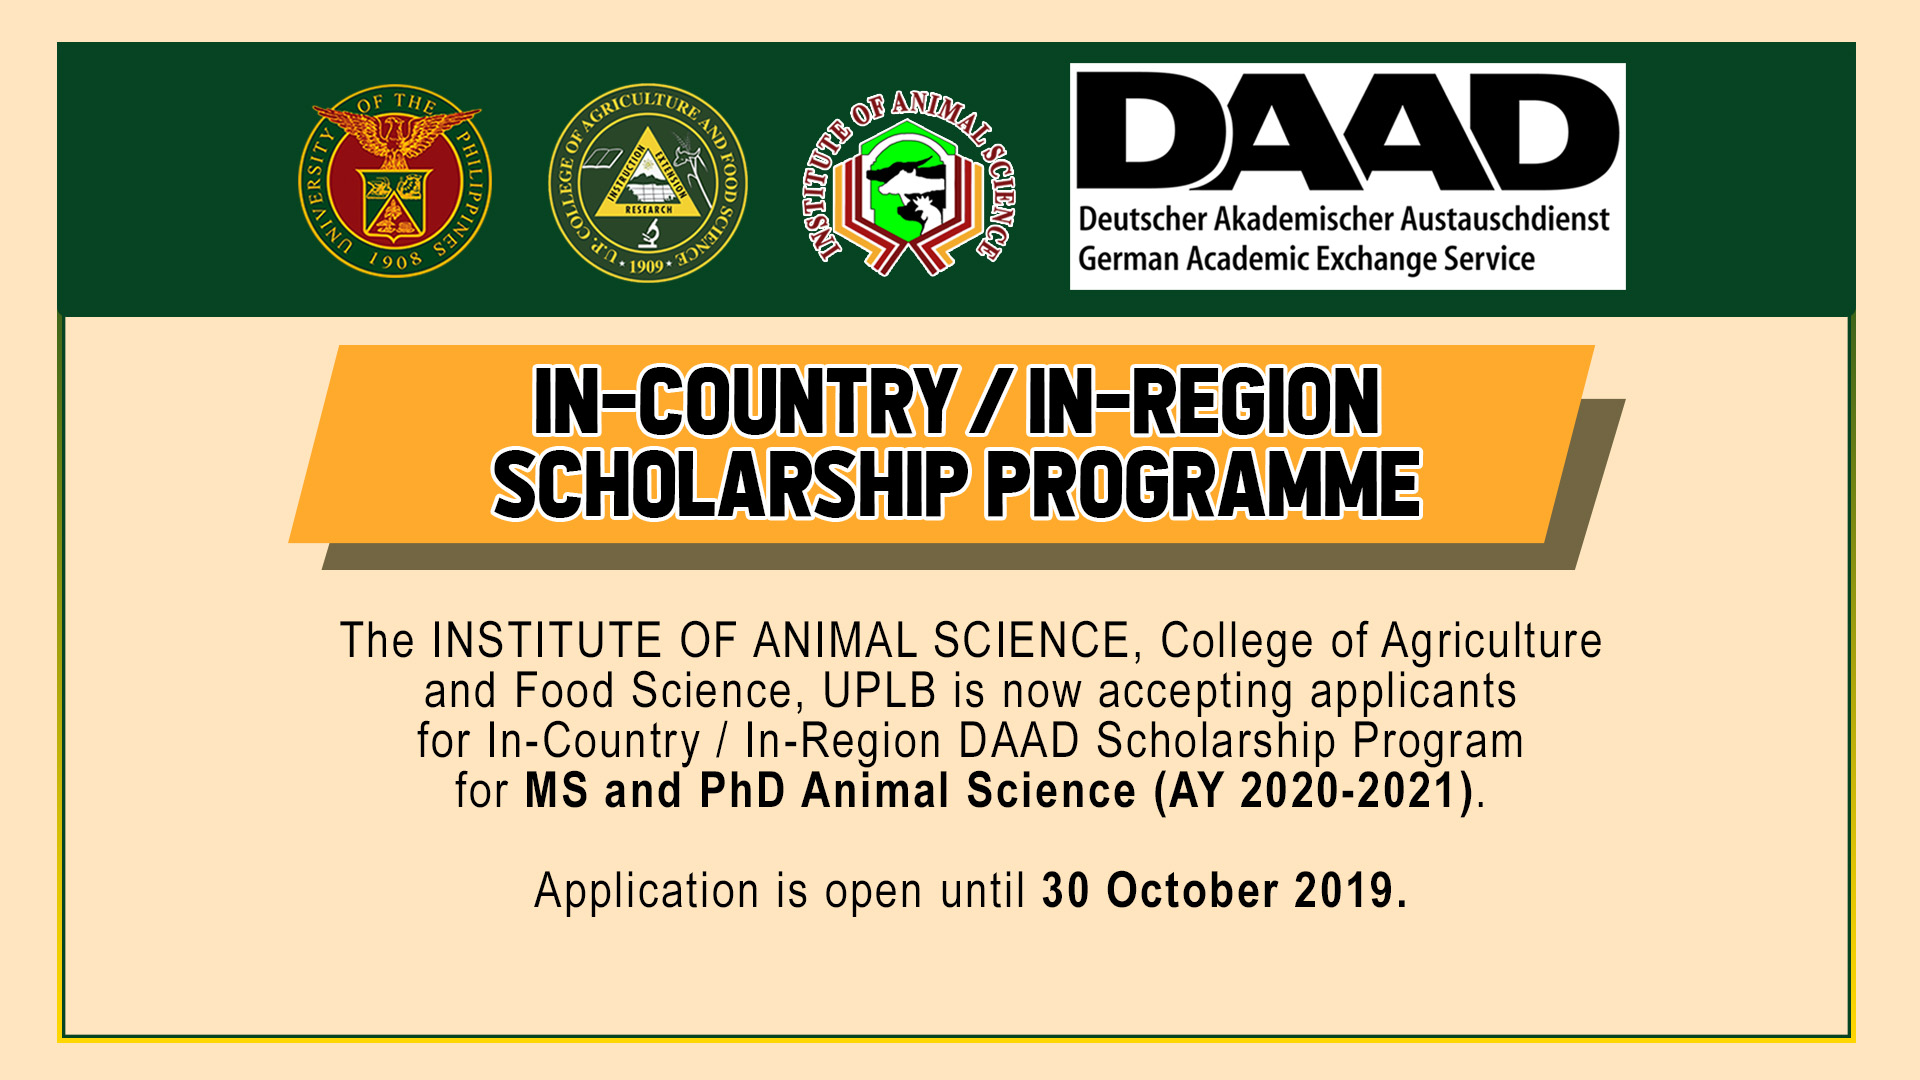 In-Country/In-Region DAAD Scholarship Program